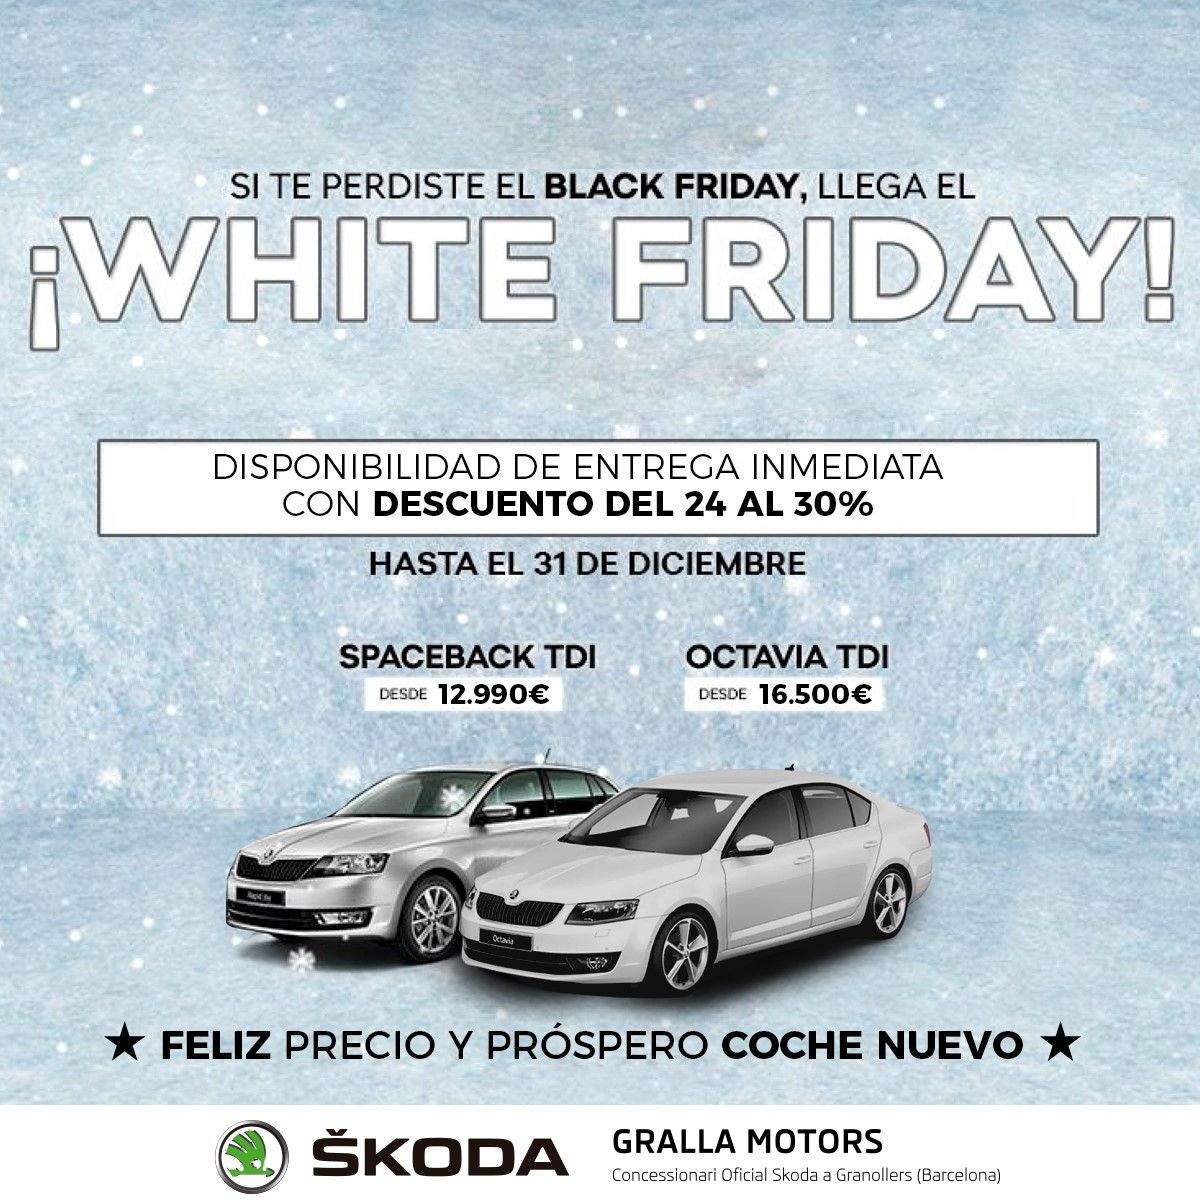 Llega el White Friday en Gralla Motors